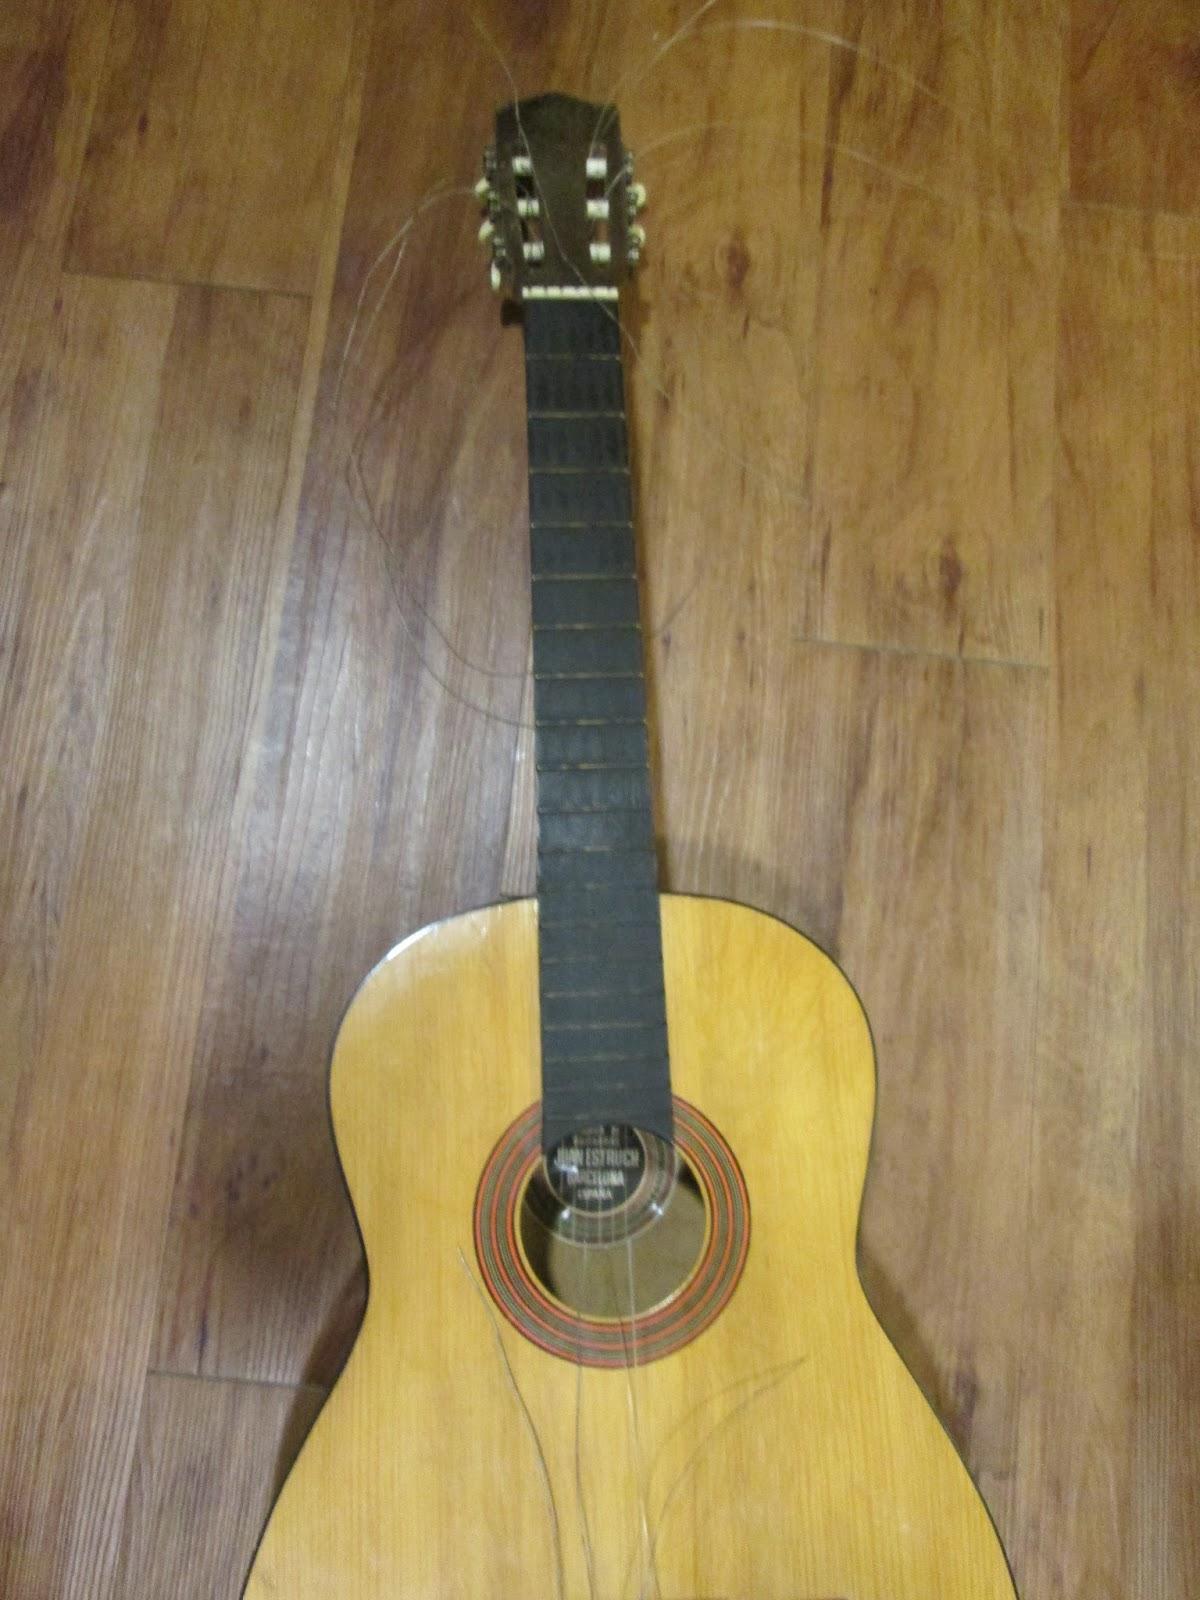 Mattwins]: Juan Estruch Classical Acoustic Guitar Review and